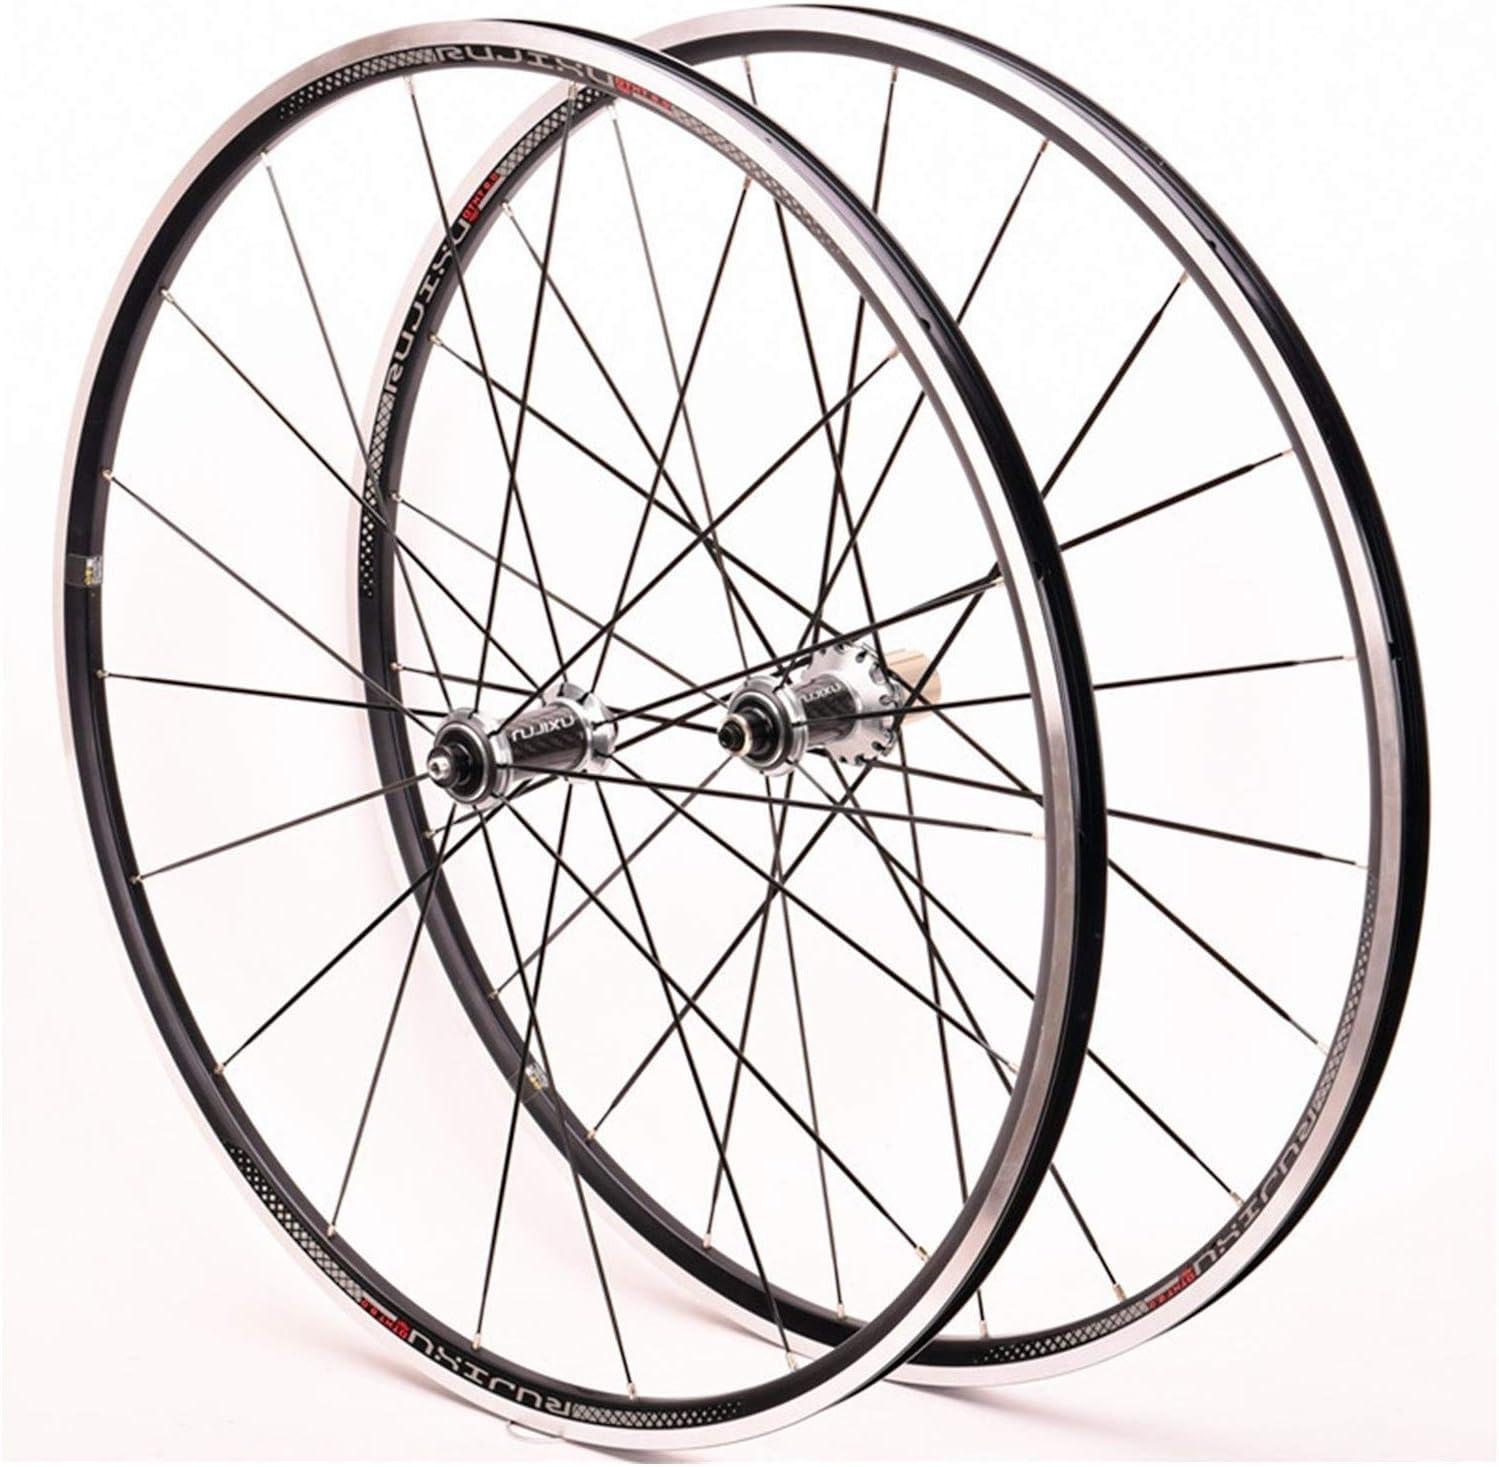 ZNND 700C Road Bike Front unisex Rear Alu Ultra-Light Bicycle Set Free Shipping New Wheel